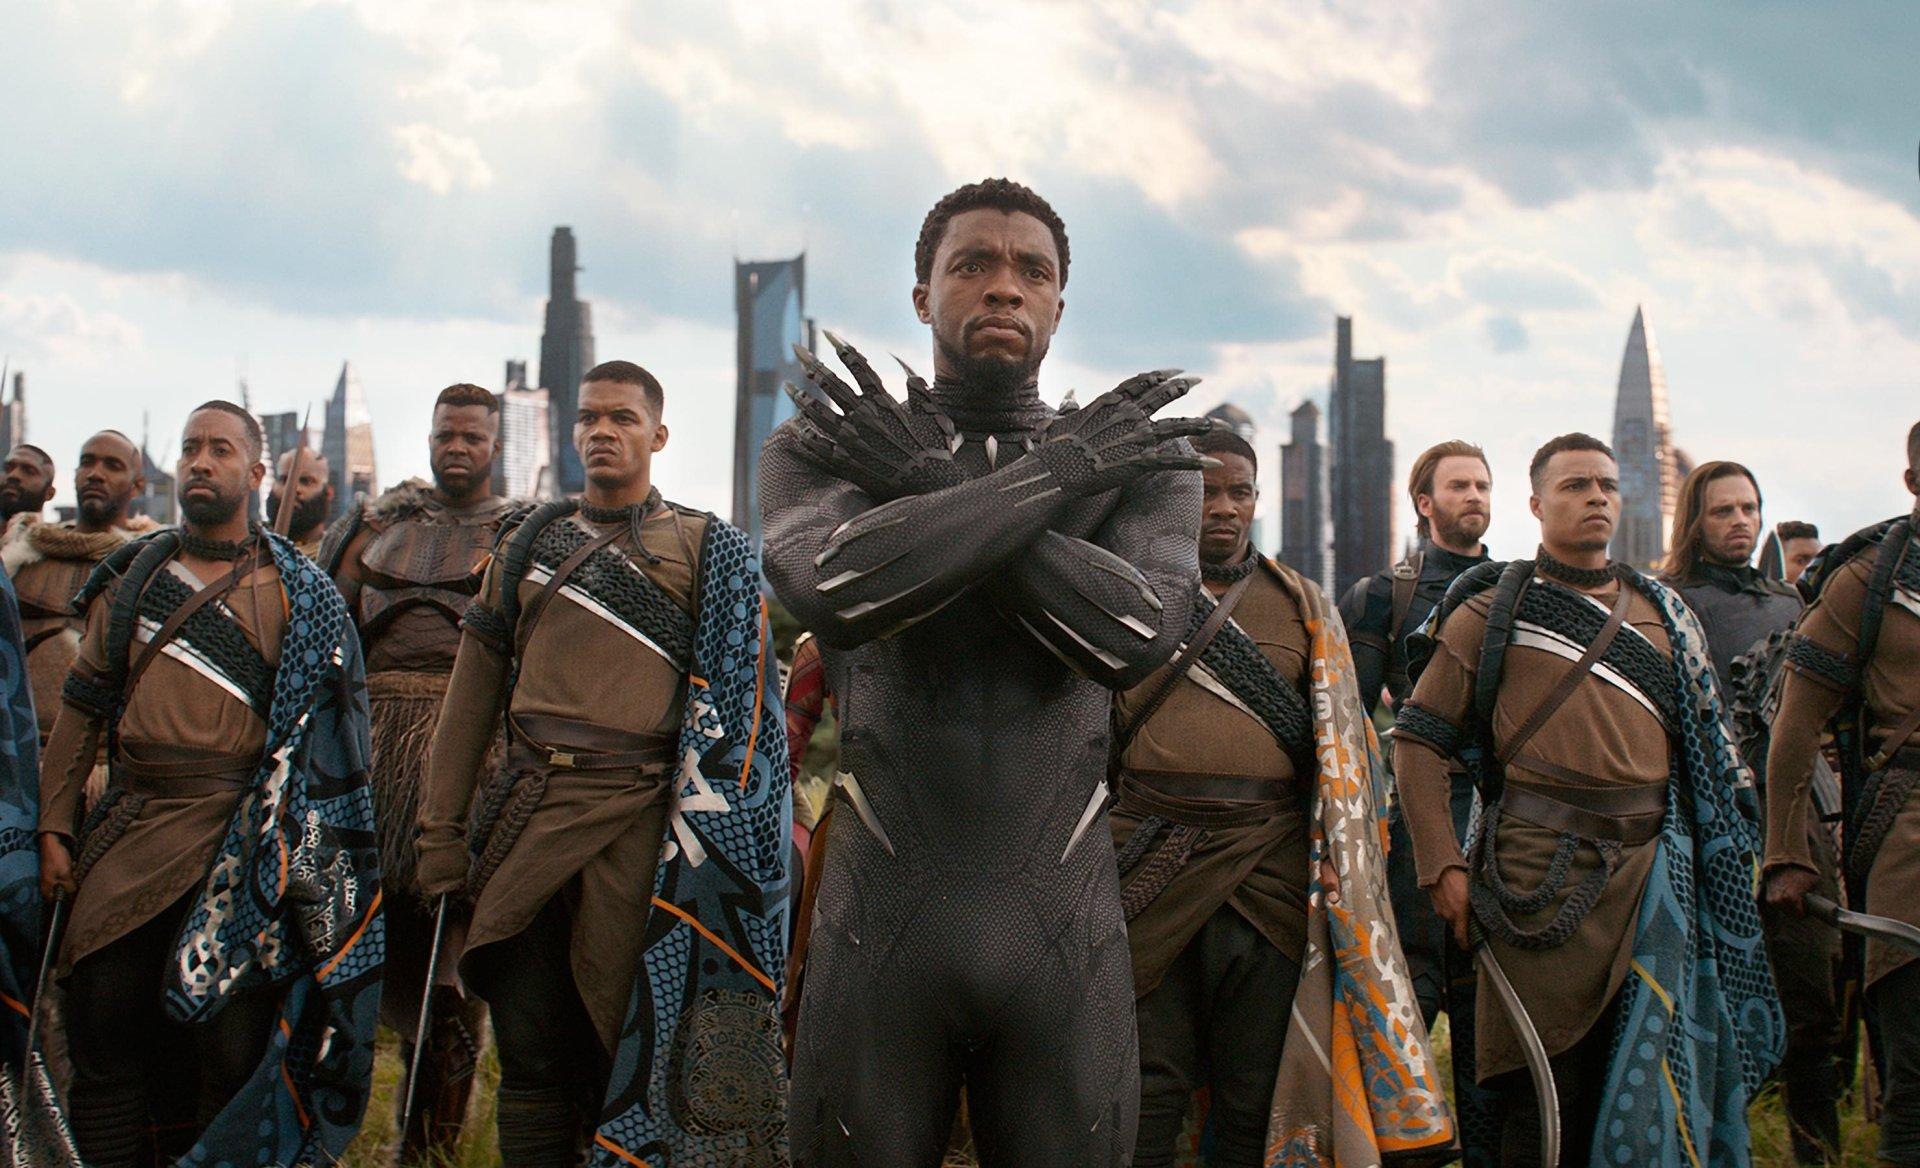 Movie - Avengers: Infinity War  Black Panther (Marvel Comics) Chadwick Boseman M'Baku (Marvel Comics) Winston Duke Captain America Winter Soldier Chris Evans Sebastian Stan Wallpaper